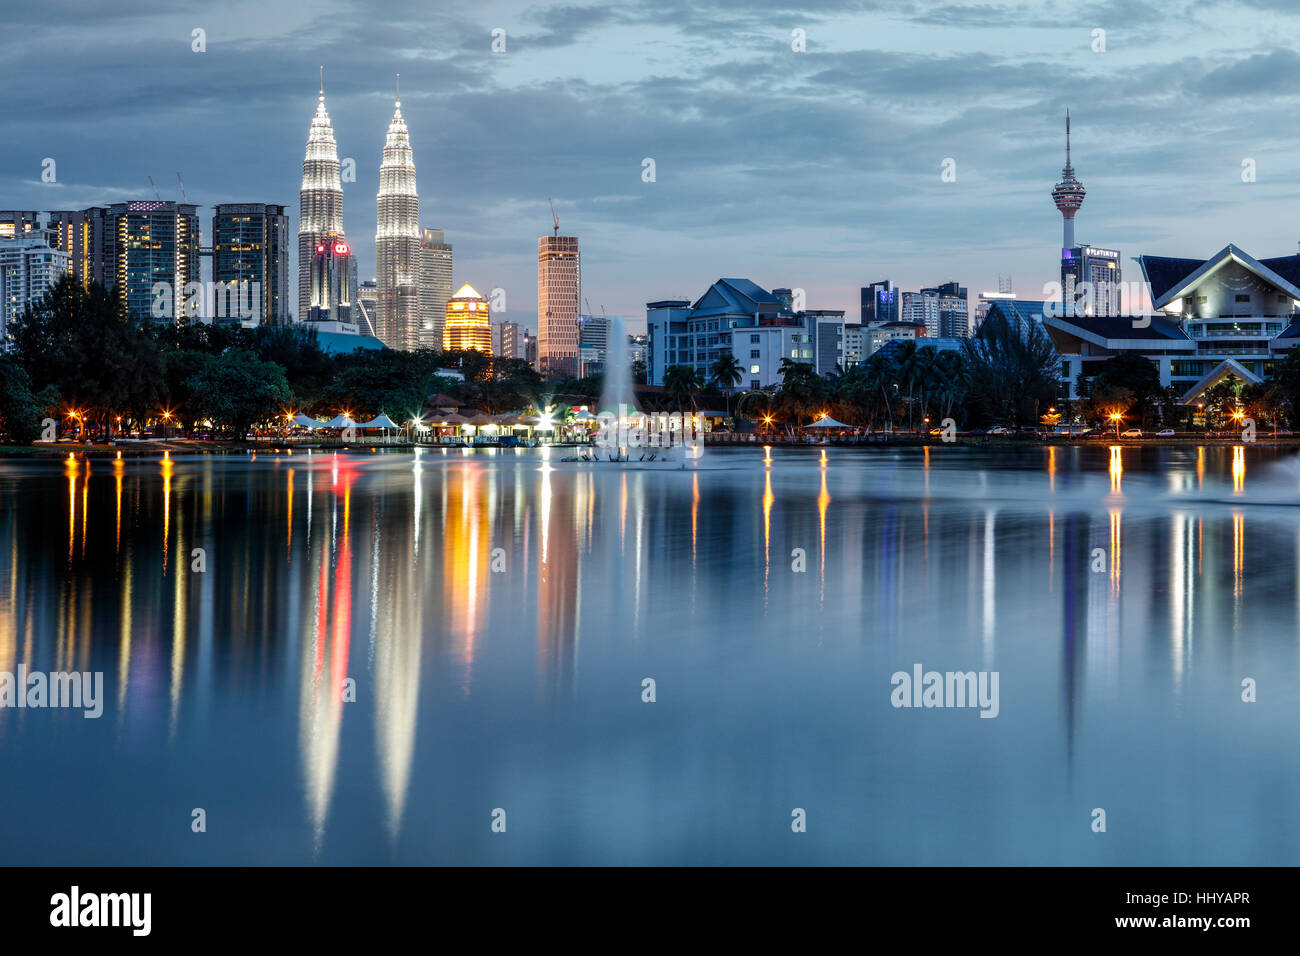 Le Kuala Lumpur skyline at Dusk. Photo Stock